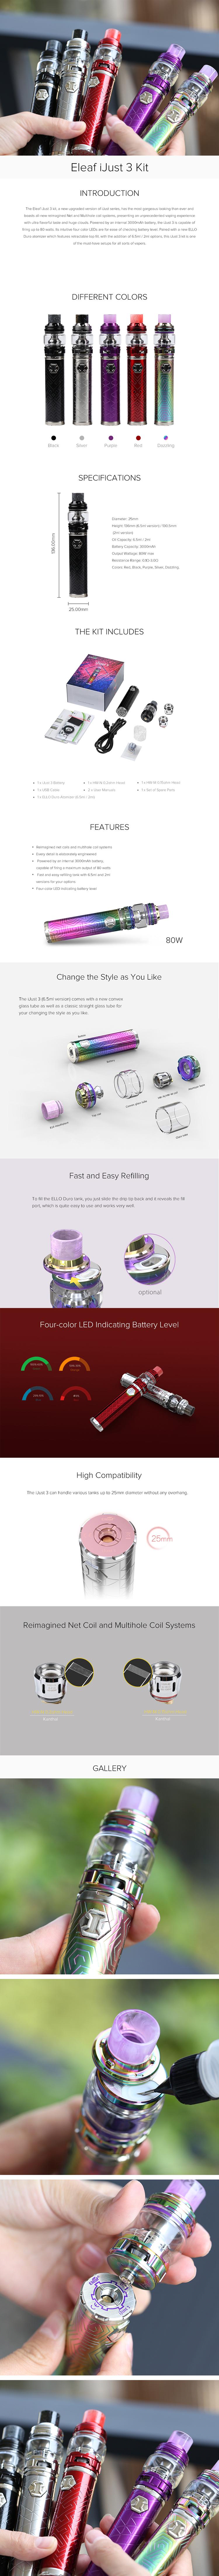 Eleaf iJust 3 Starter Kit